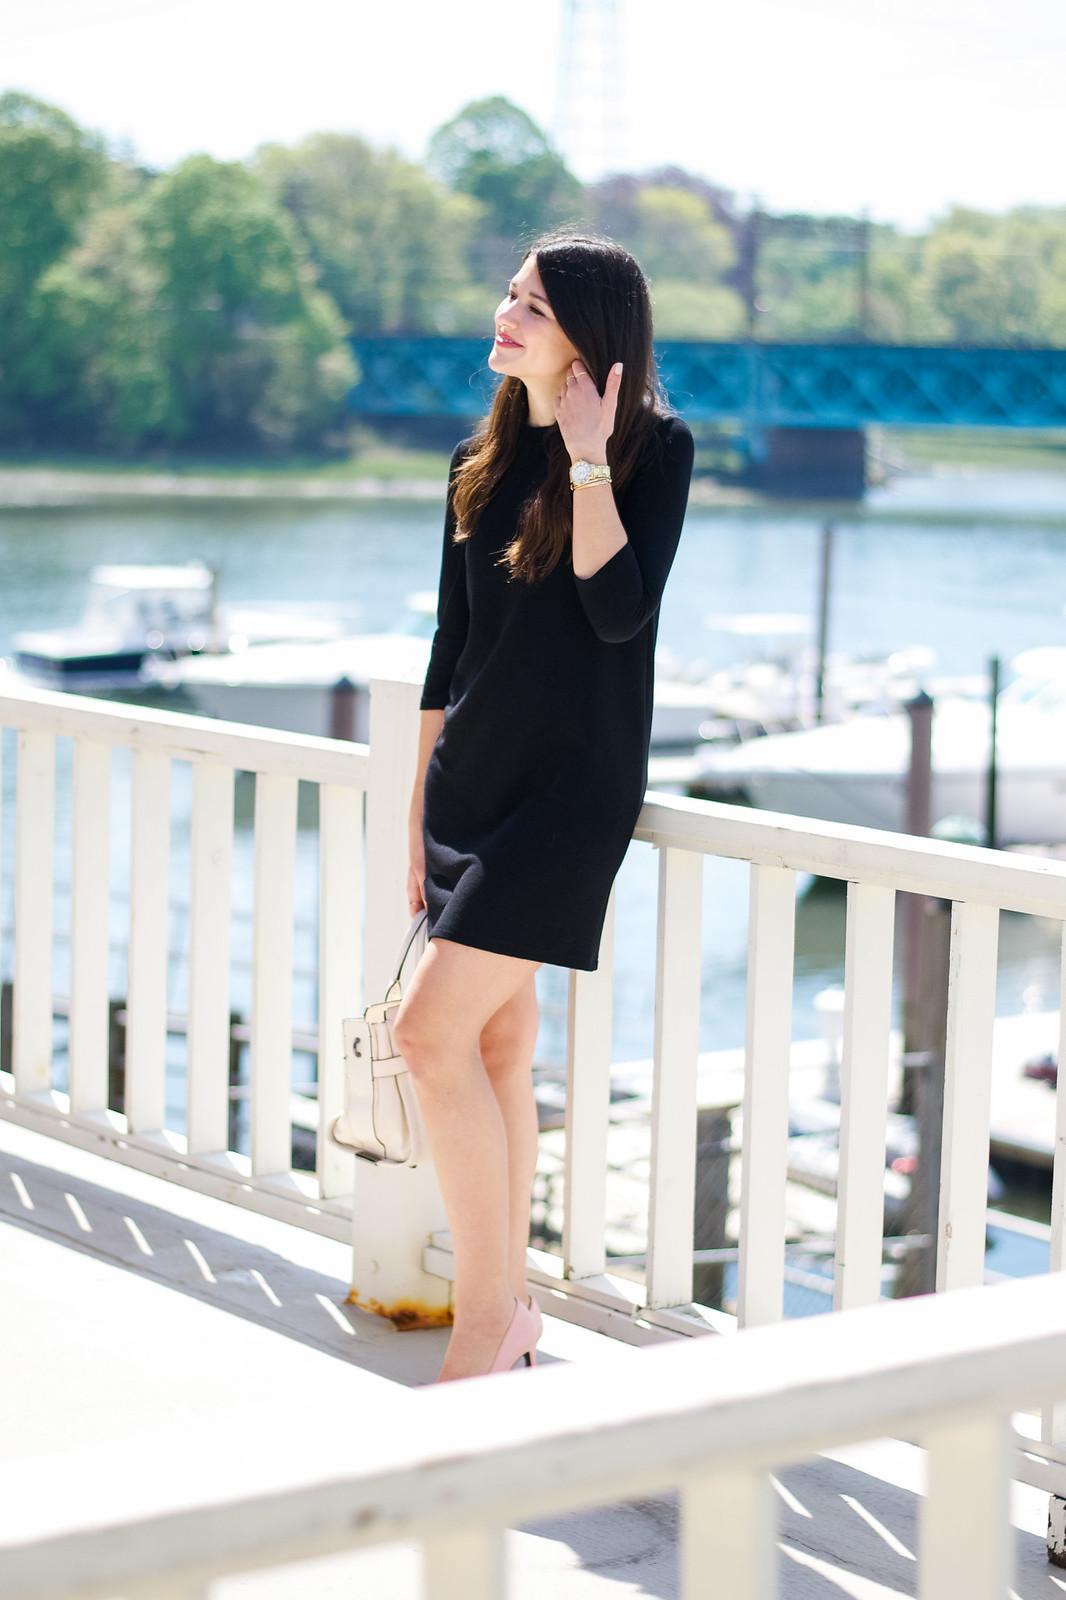 Asos Black Shift Dress Outfit